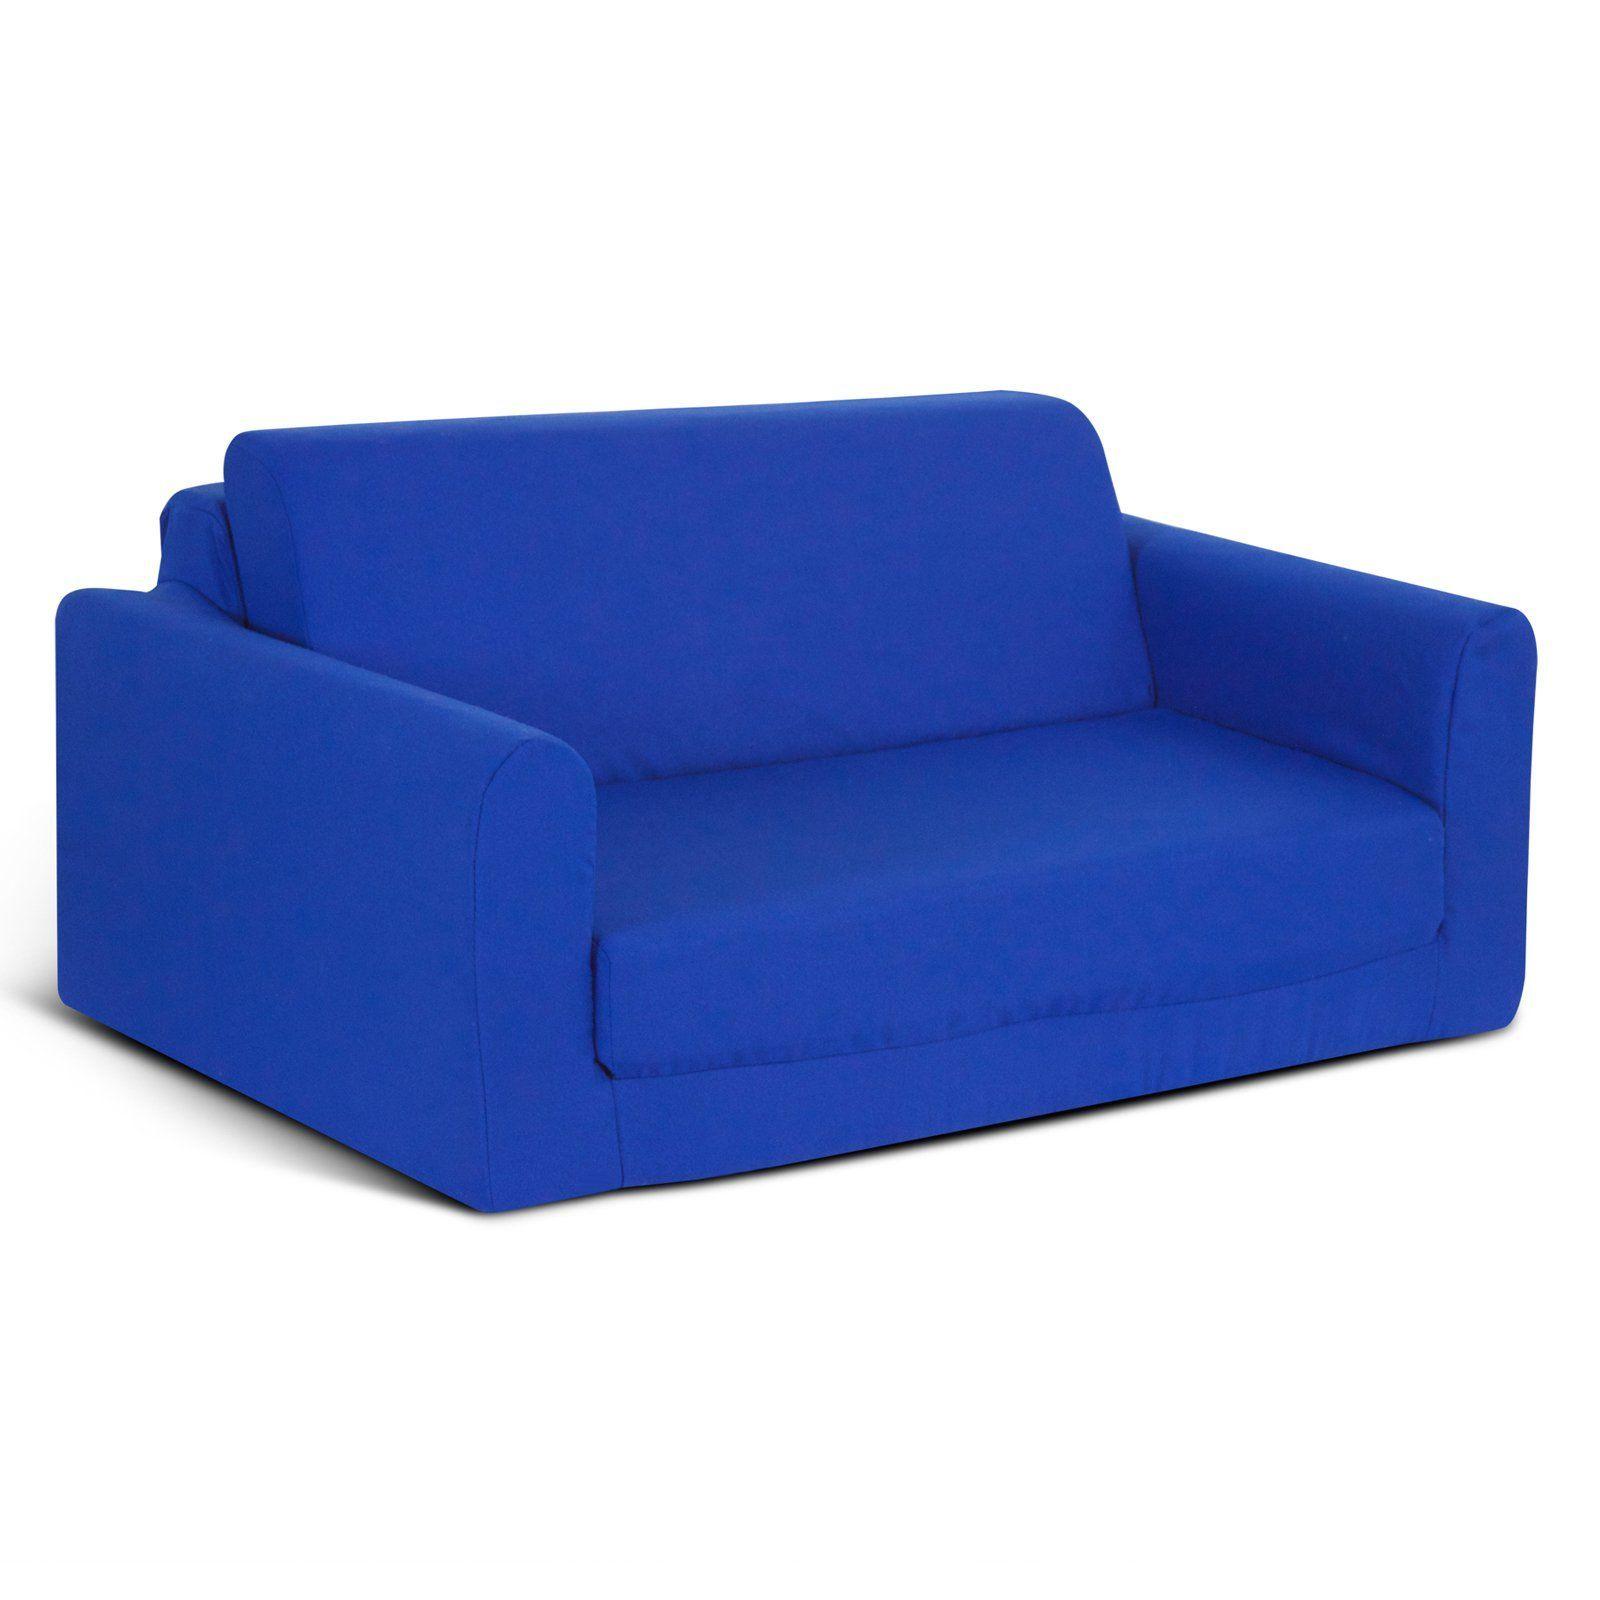 american furniture alliance juvenile poly cotton futon   34 in    32 4200 american furniture alliance juvenile poly cotton futon   34 in      rh   pinterest